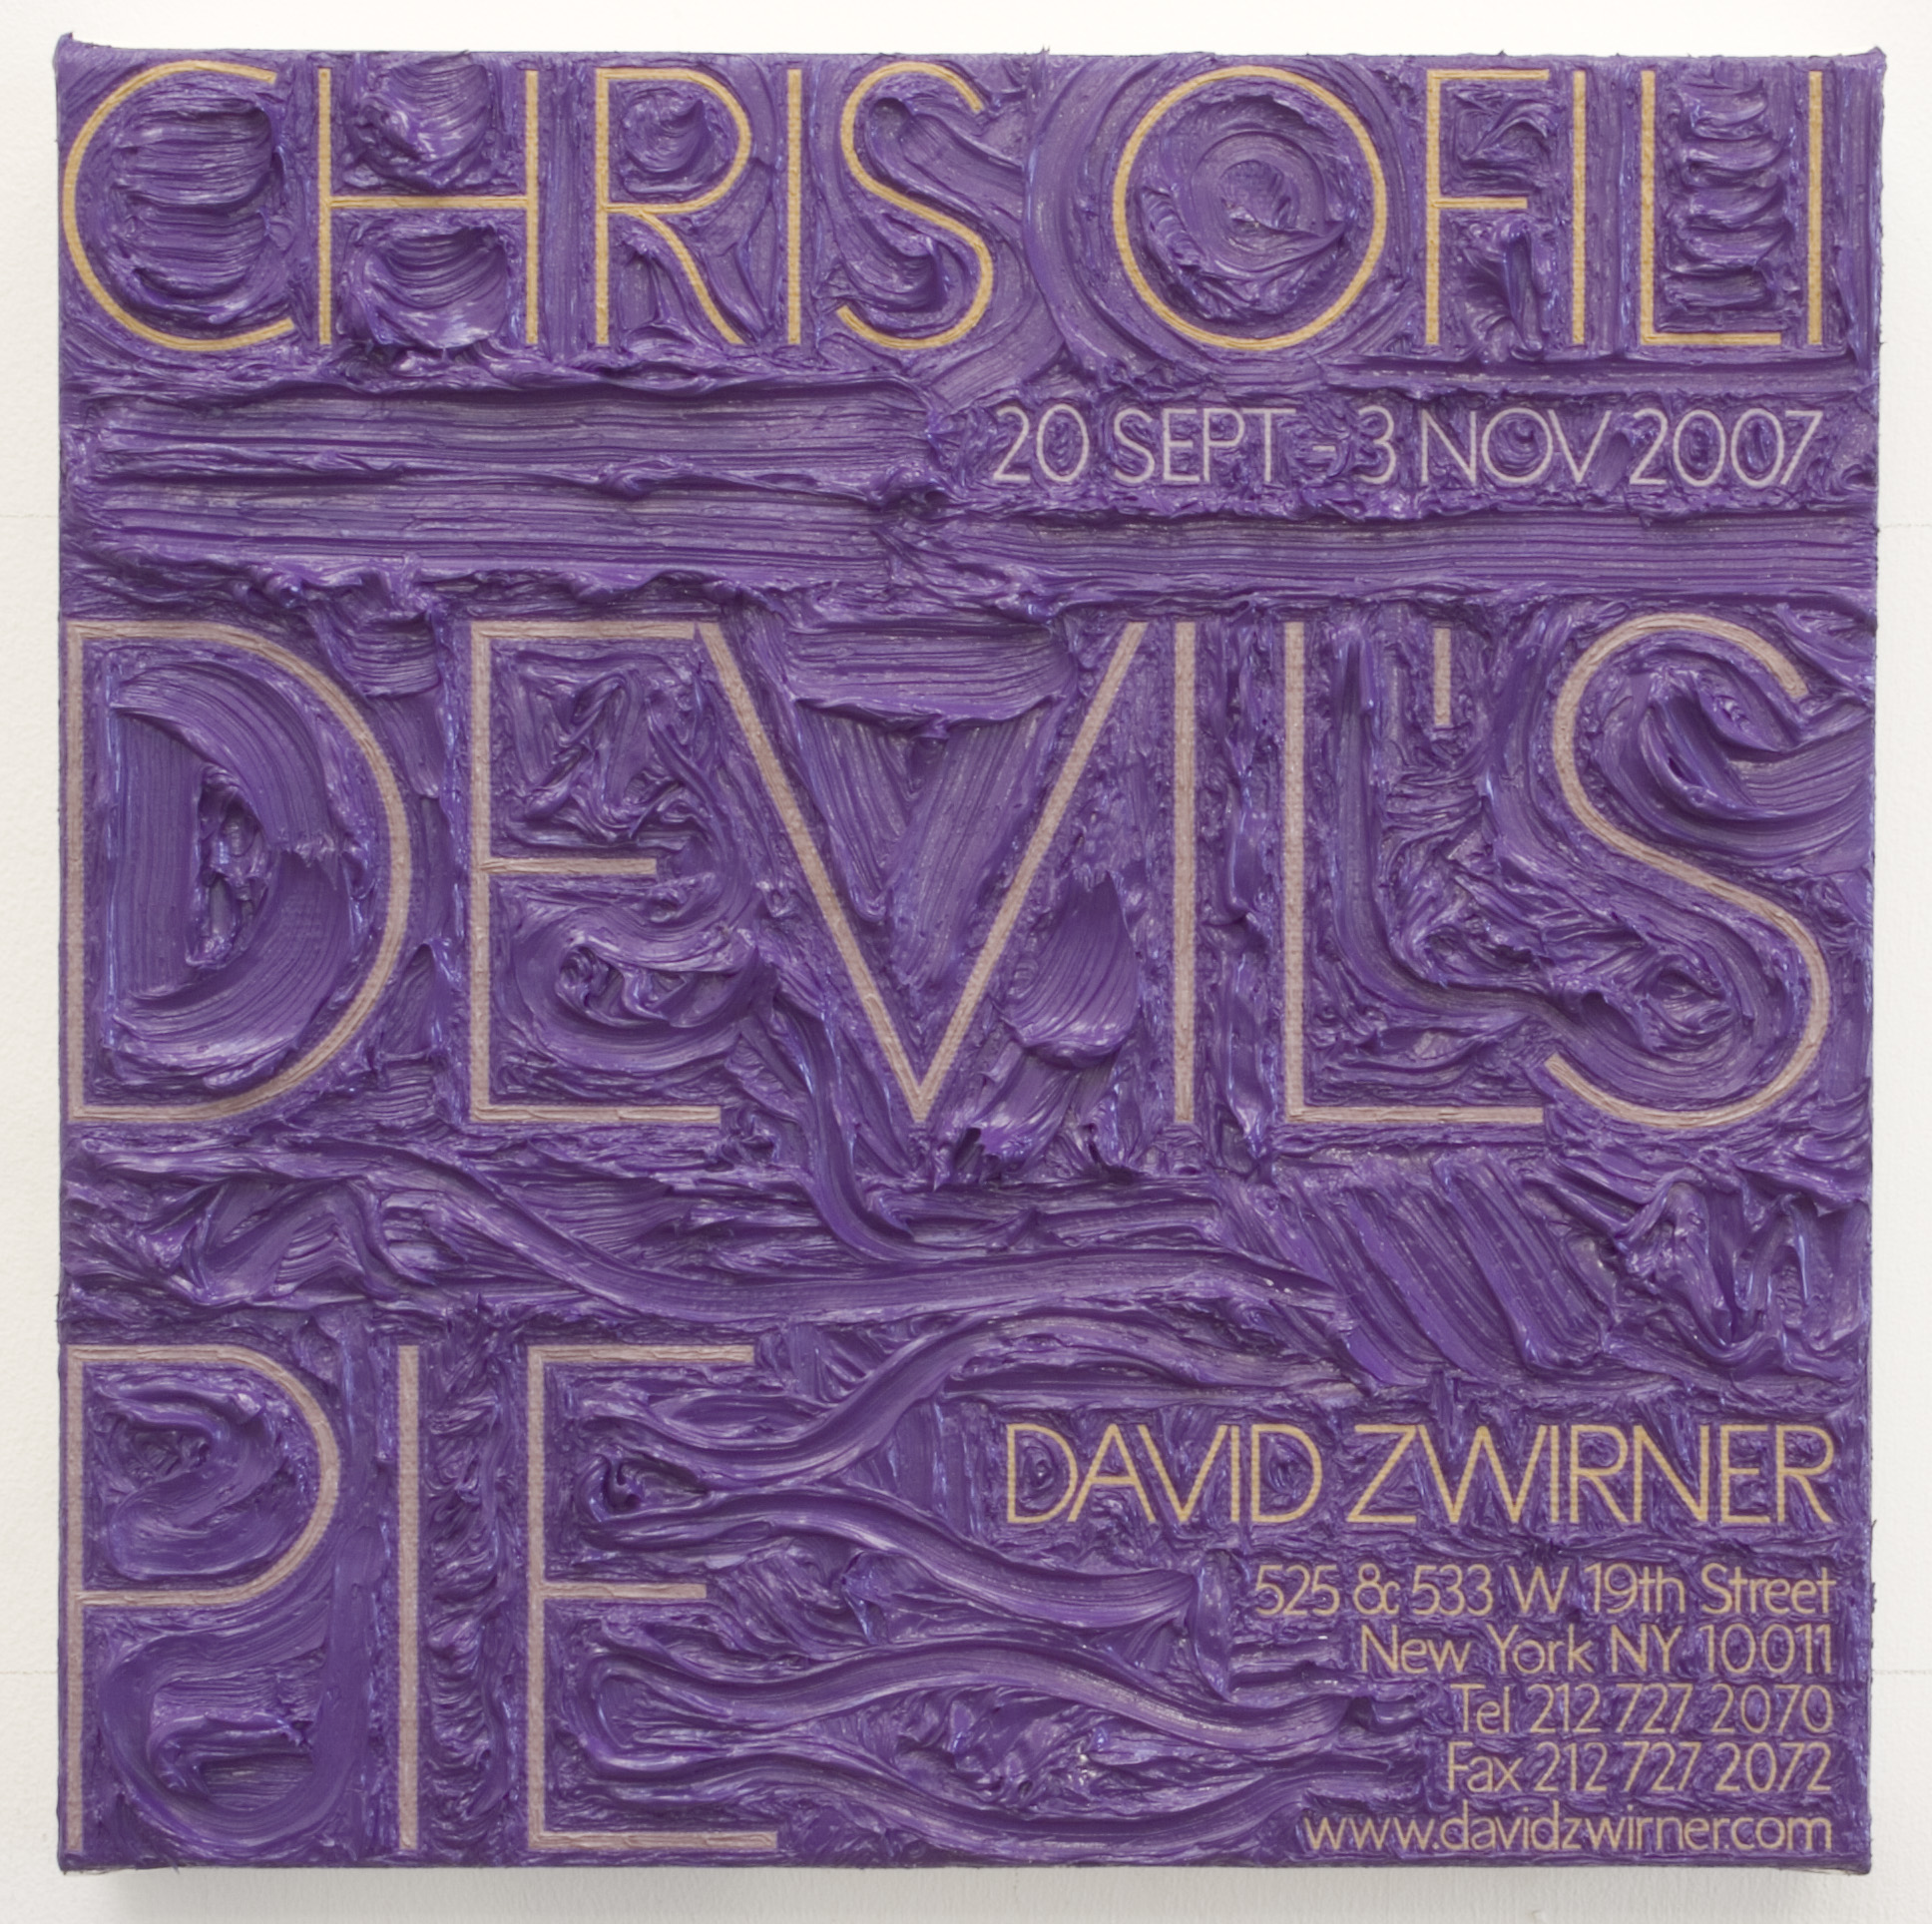 Chris Ofili at David Zwirner